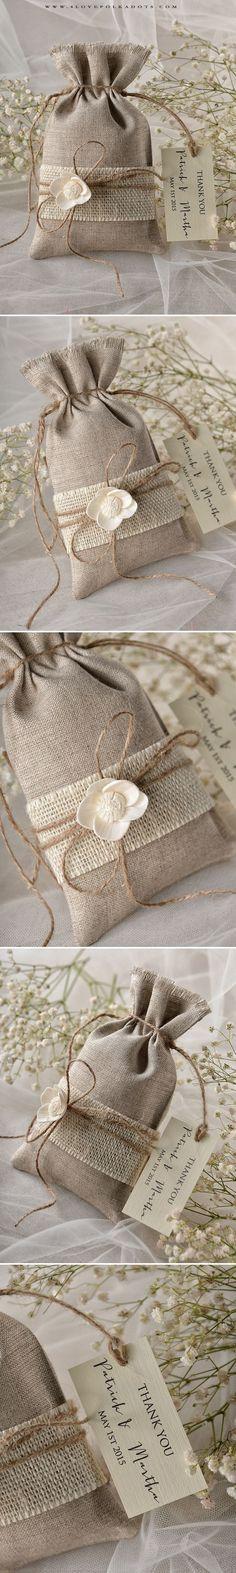 Wedding Linen Favor Bags with paper tag #weddingideas #favorbags #summerwedding #gardenwedding